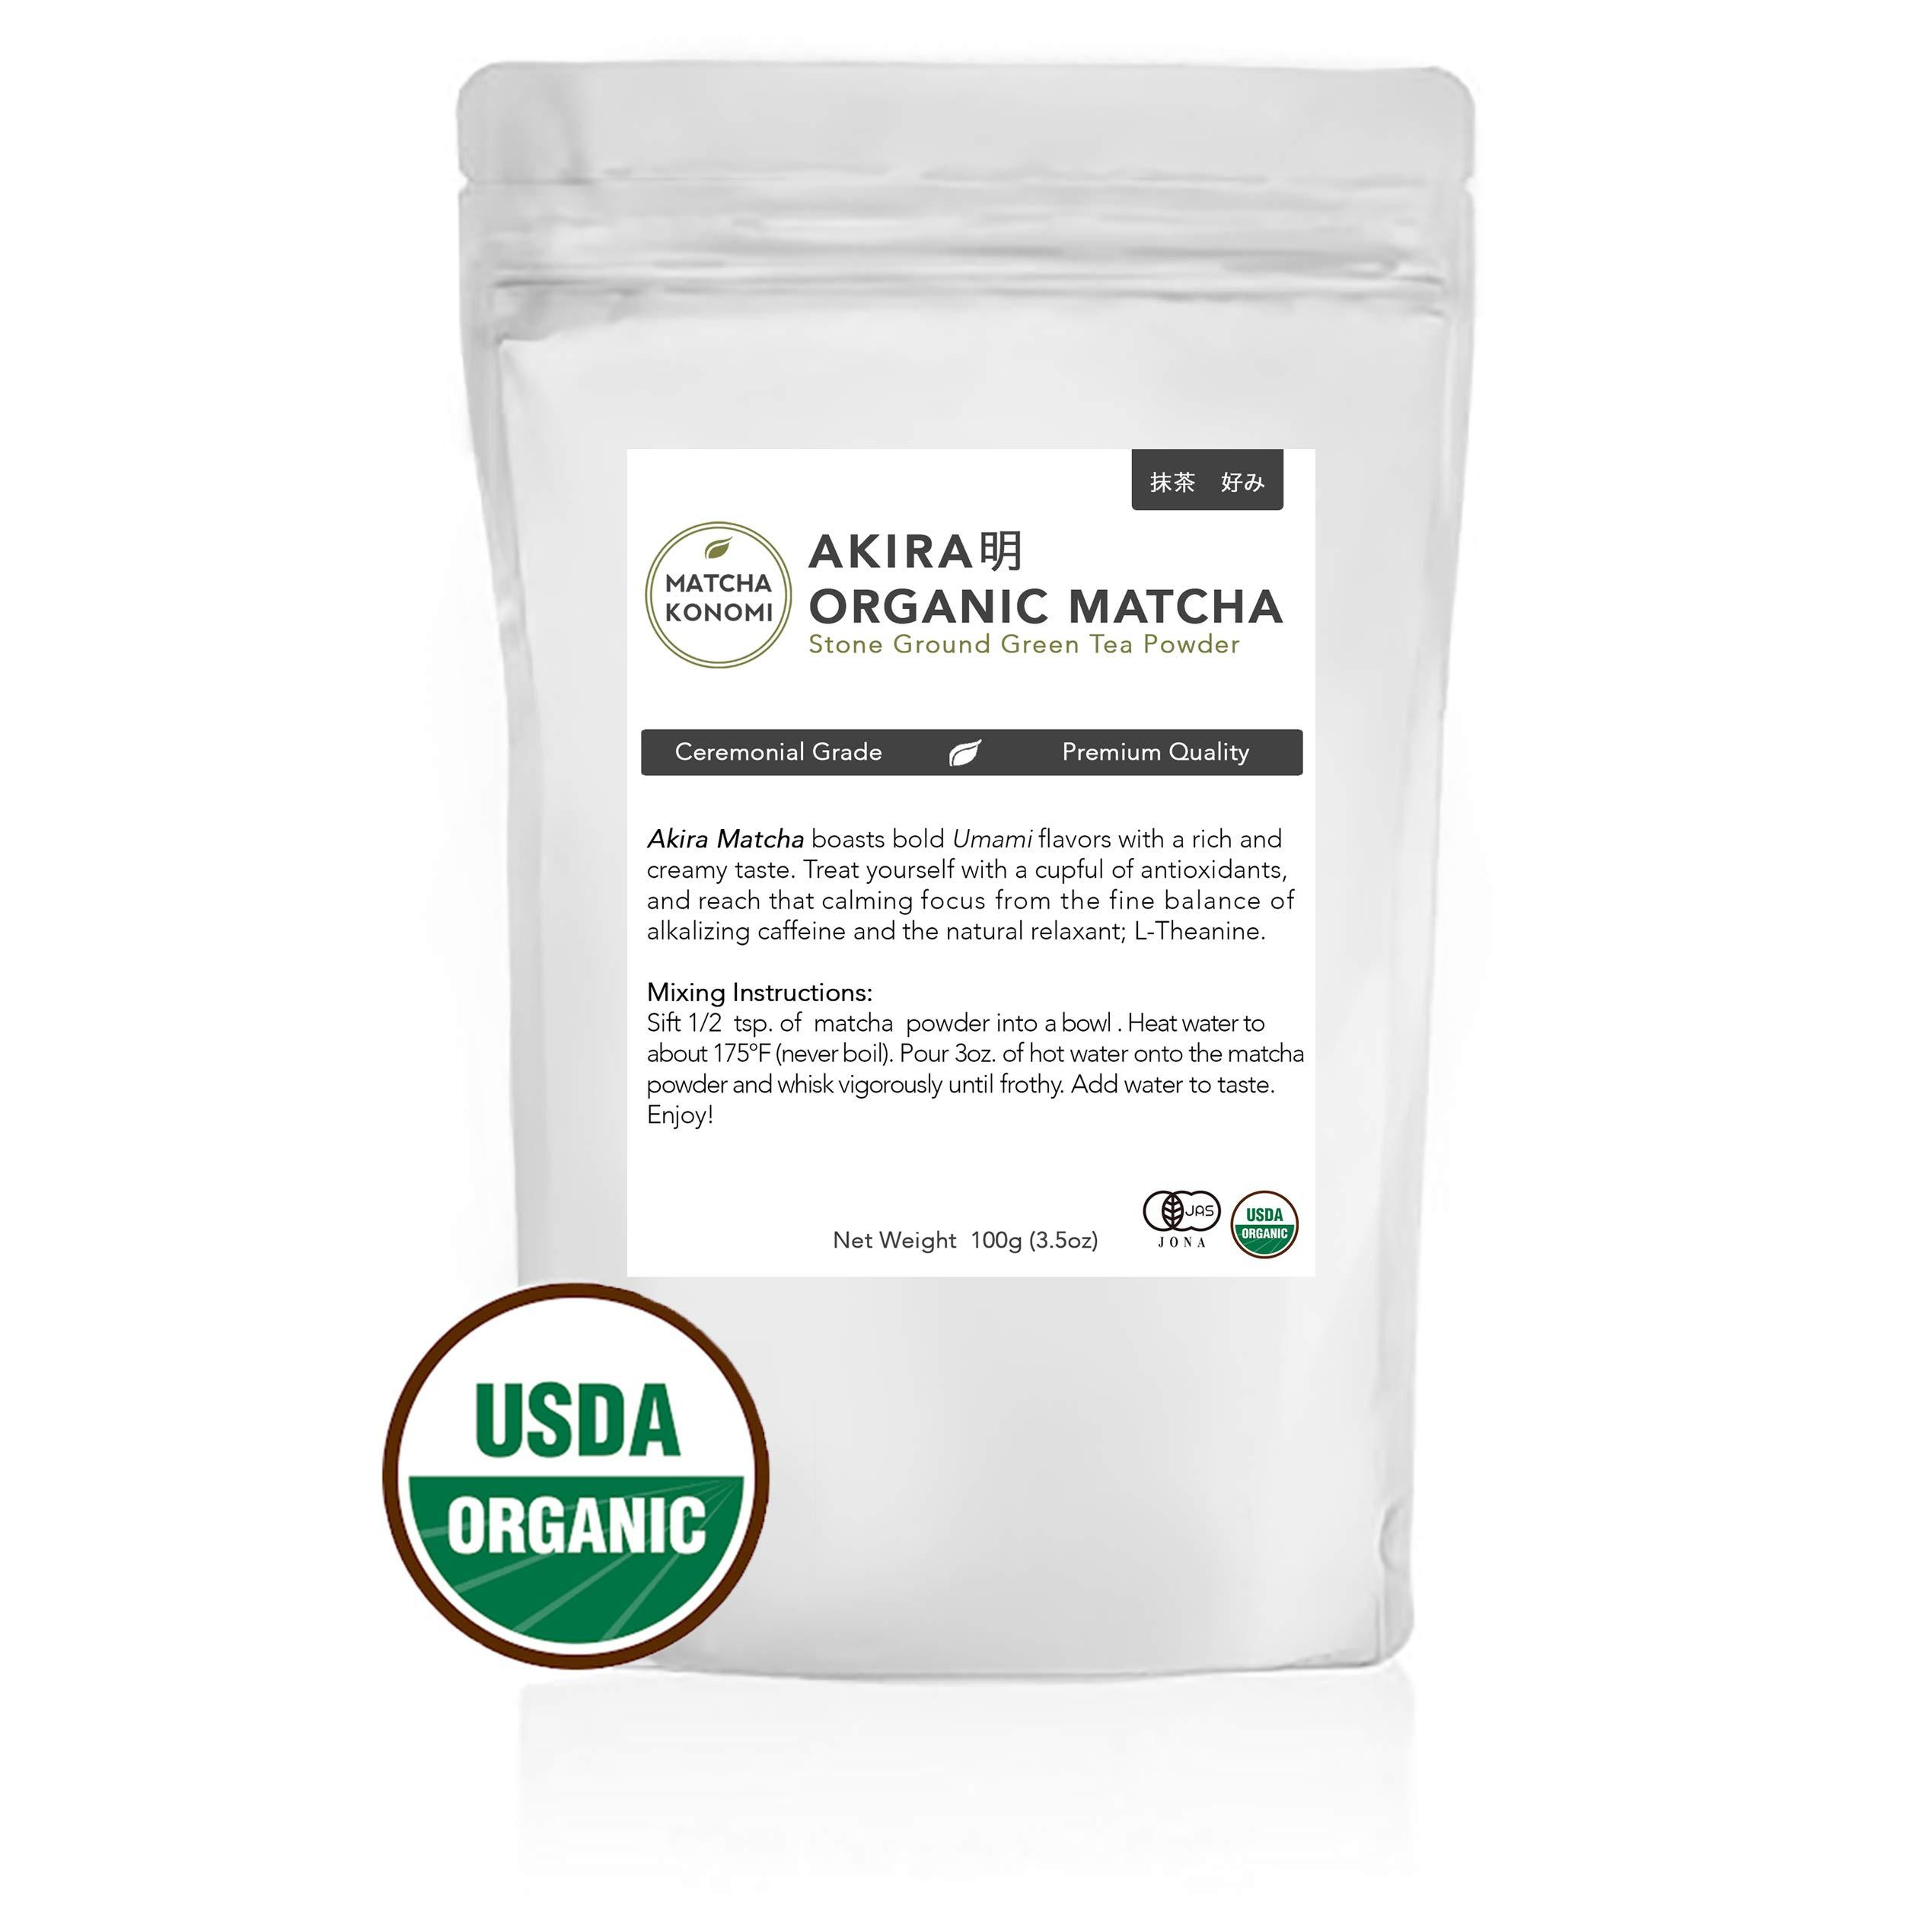 Akira Matcha 100g - Organic Premium Ceremonial Japanese Matcha Green Tea Powder - First Harvest, Radiation Free, No Additives, Zero Sugar - USDA and JAS Certified(3.5oz bag)